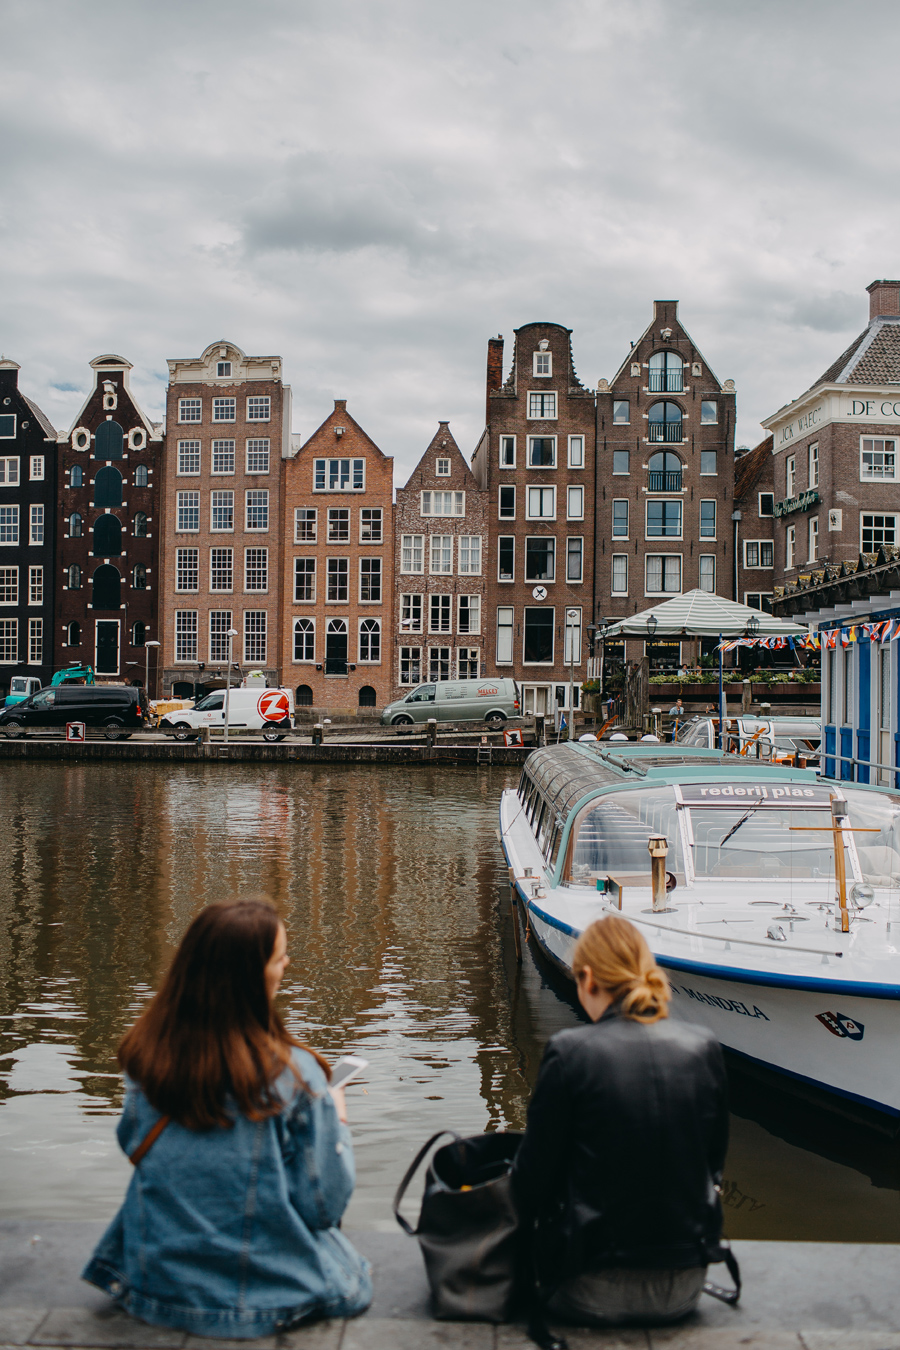 016-amsterdam-bikes-travel-photography.jpg